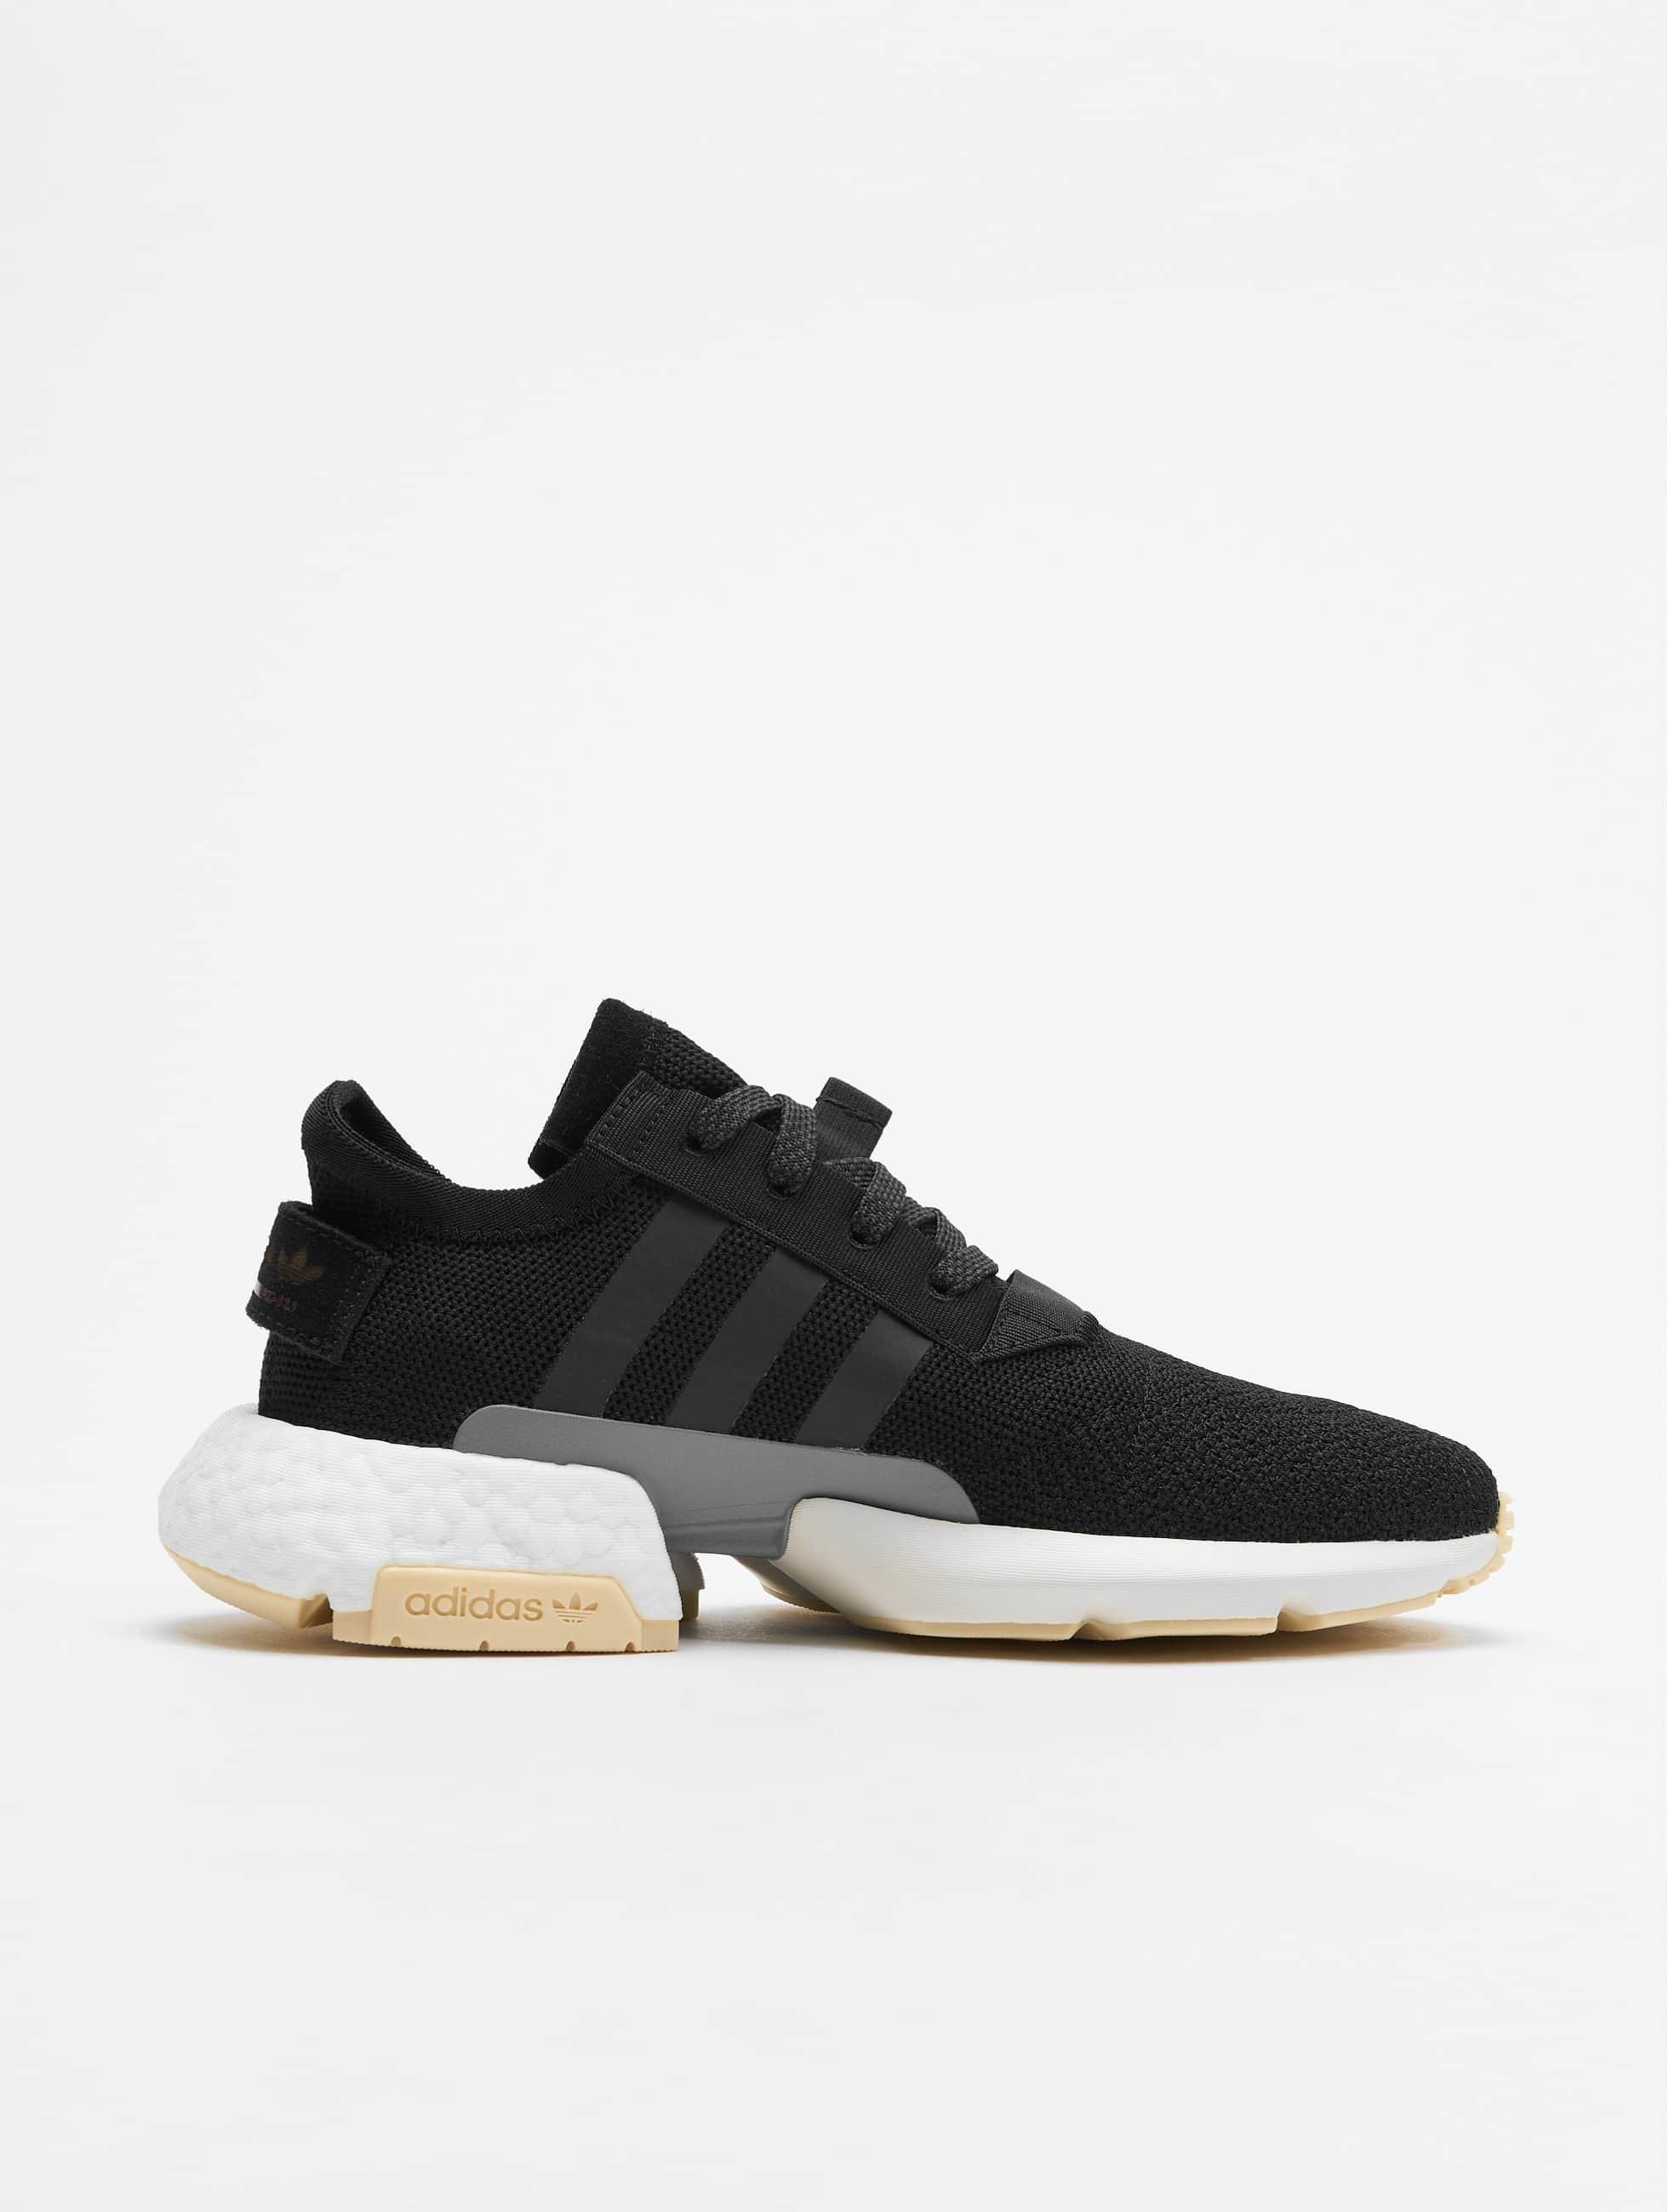 Adidas originals Damen Damen Damen Schuhe   Turnschuhe Pod-S3.1 W 900e76